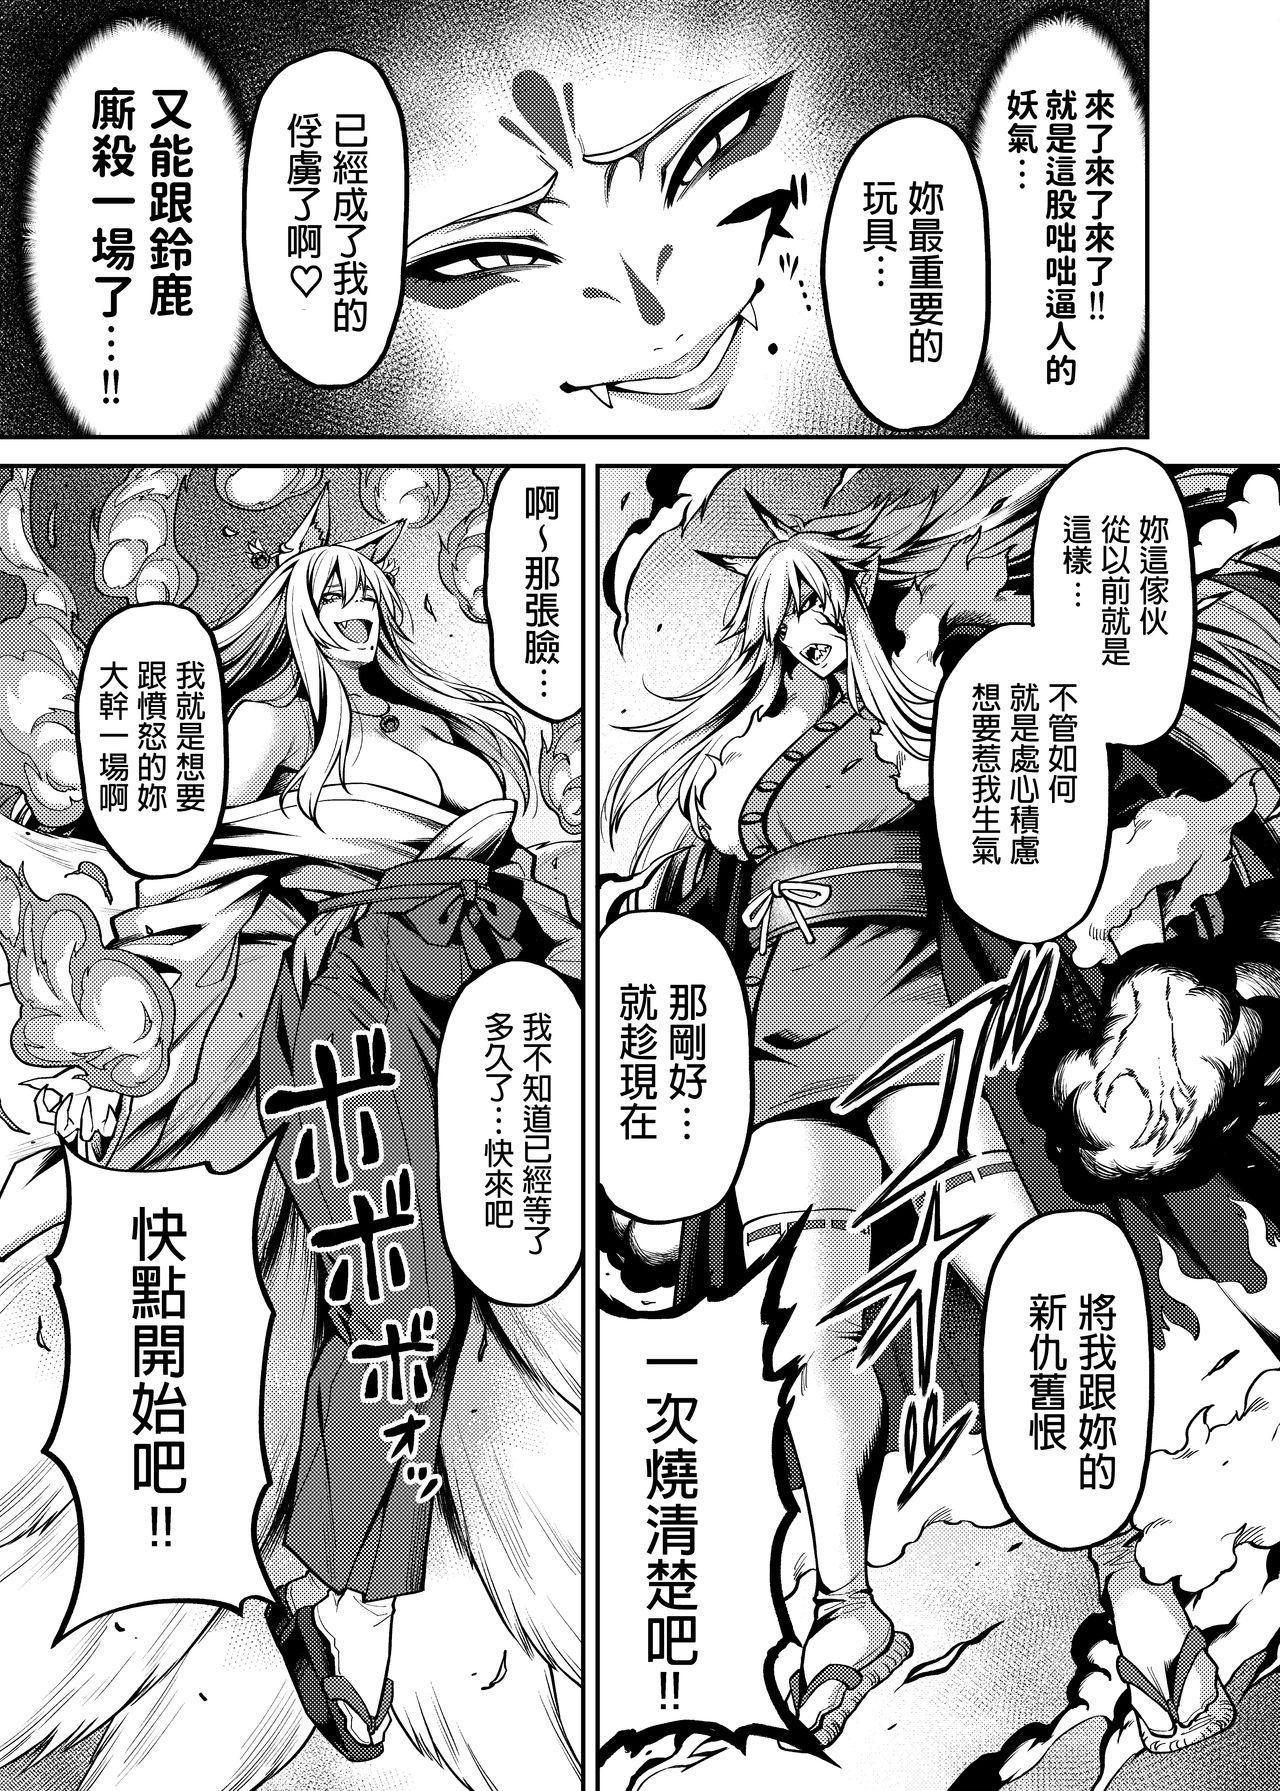 Takkun to Kitsune no Onee-san 23